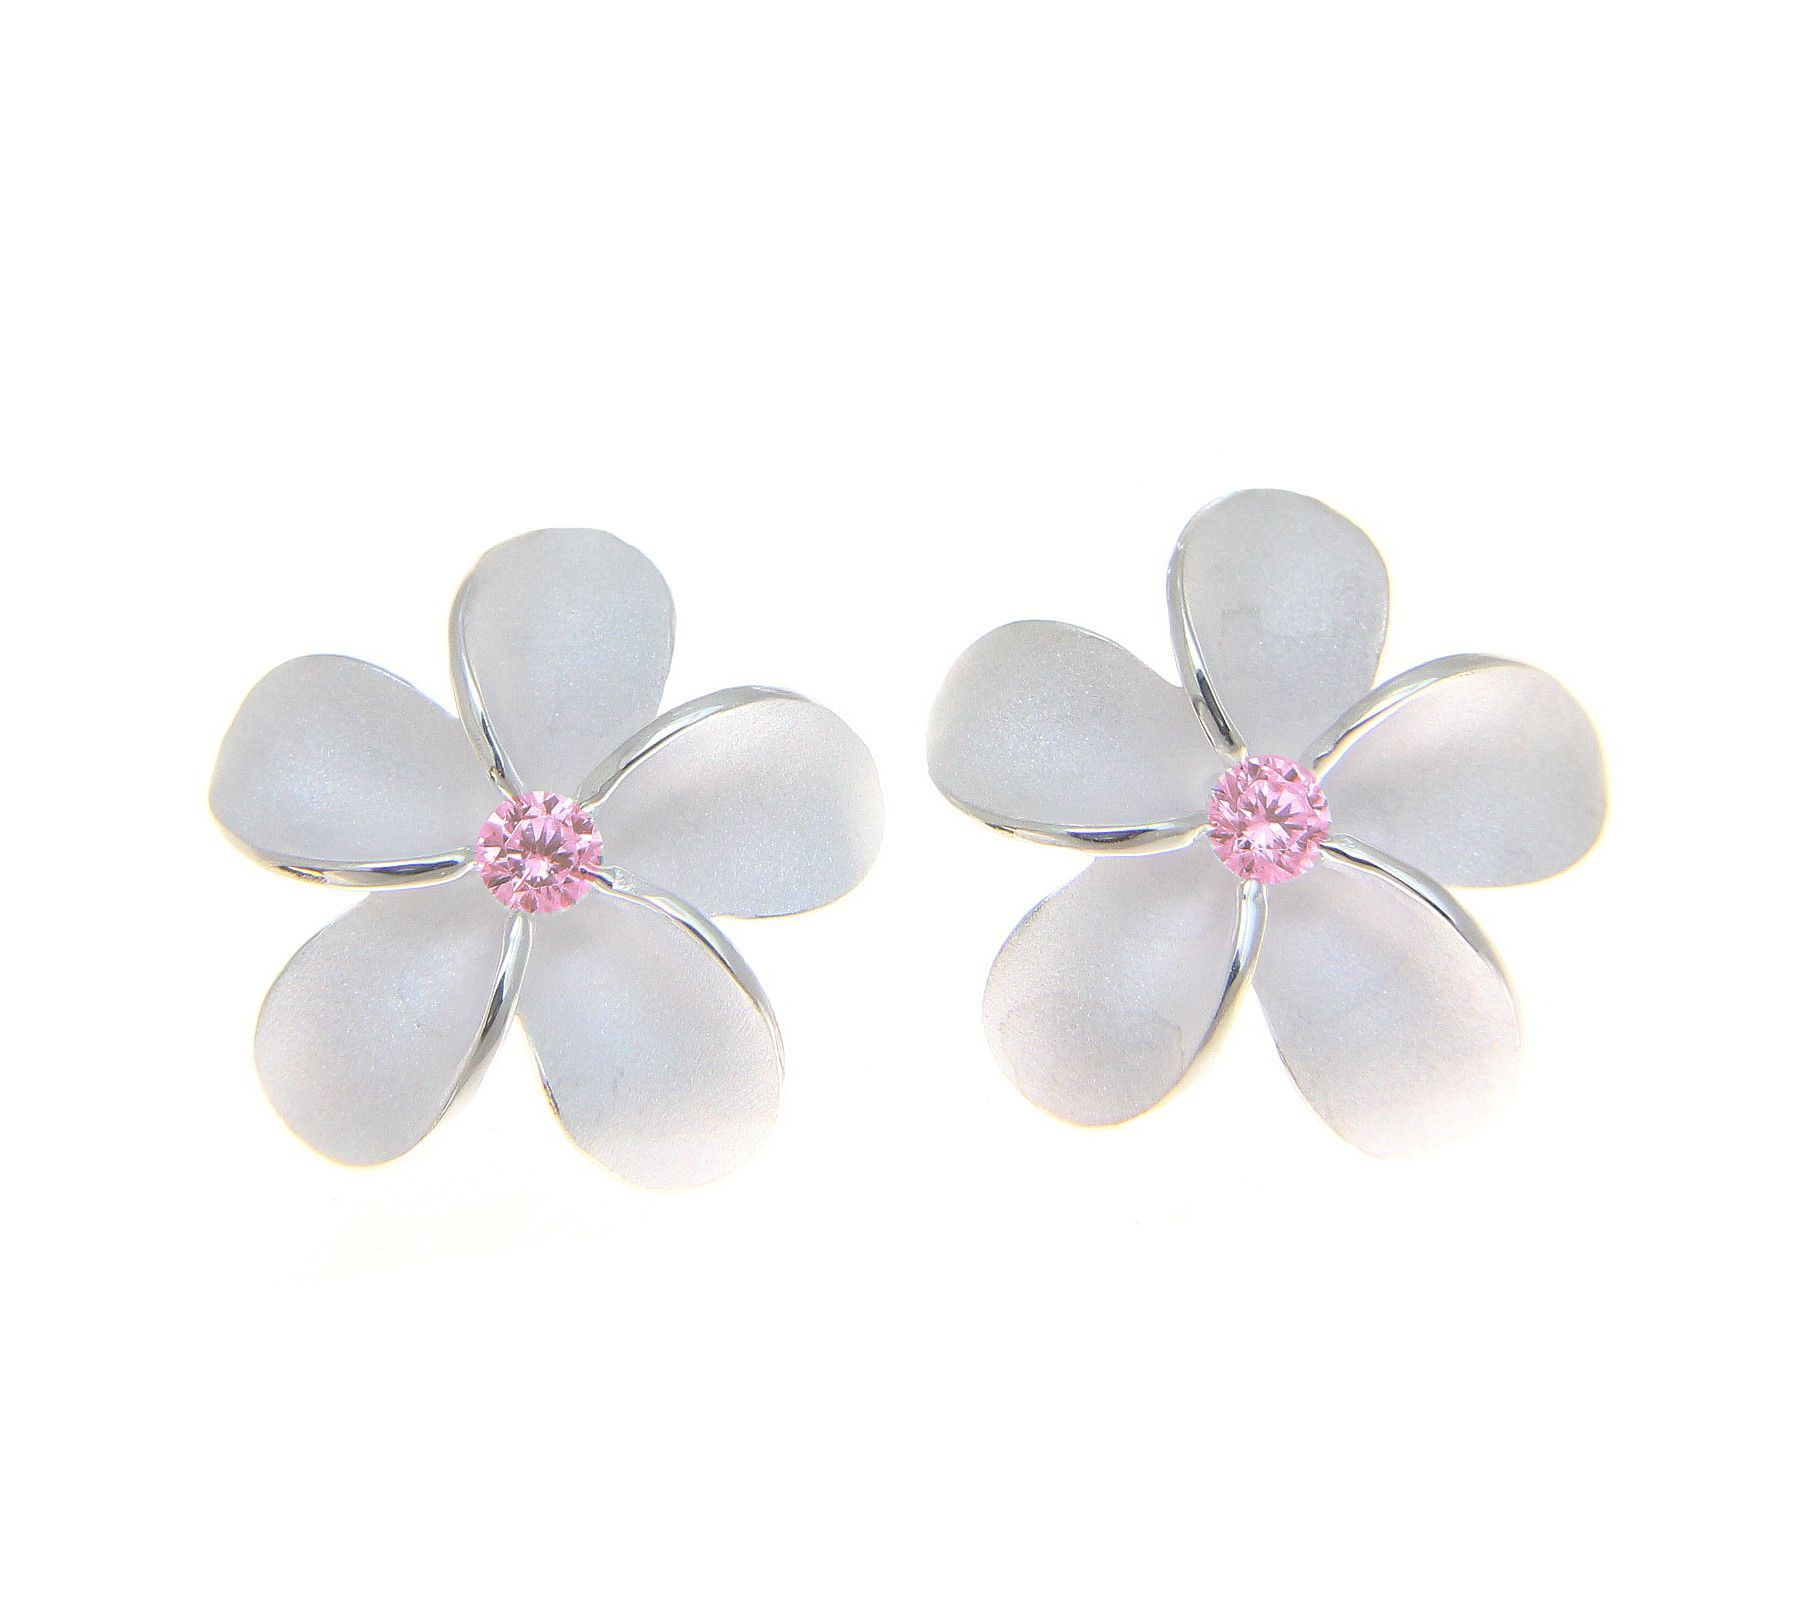 Sterling silver 925 hawaiian plumeria flower stud post earrings 15mm sterling silver 925 hawaiian plumeria flower stud post earrings 15mm pink cz izmirmasajfo